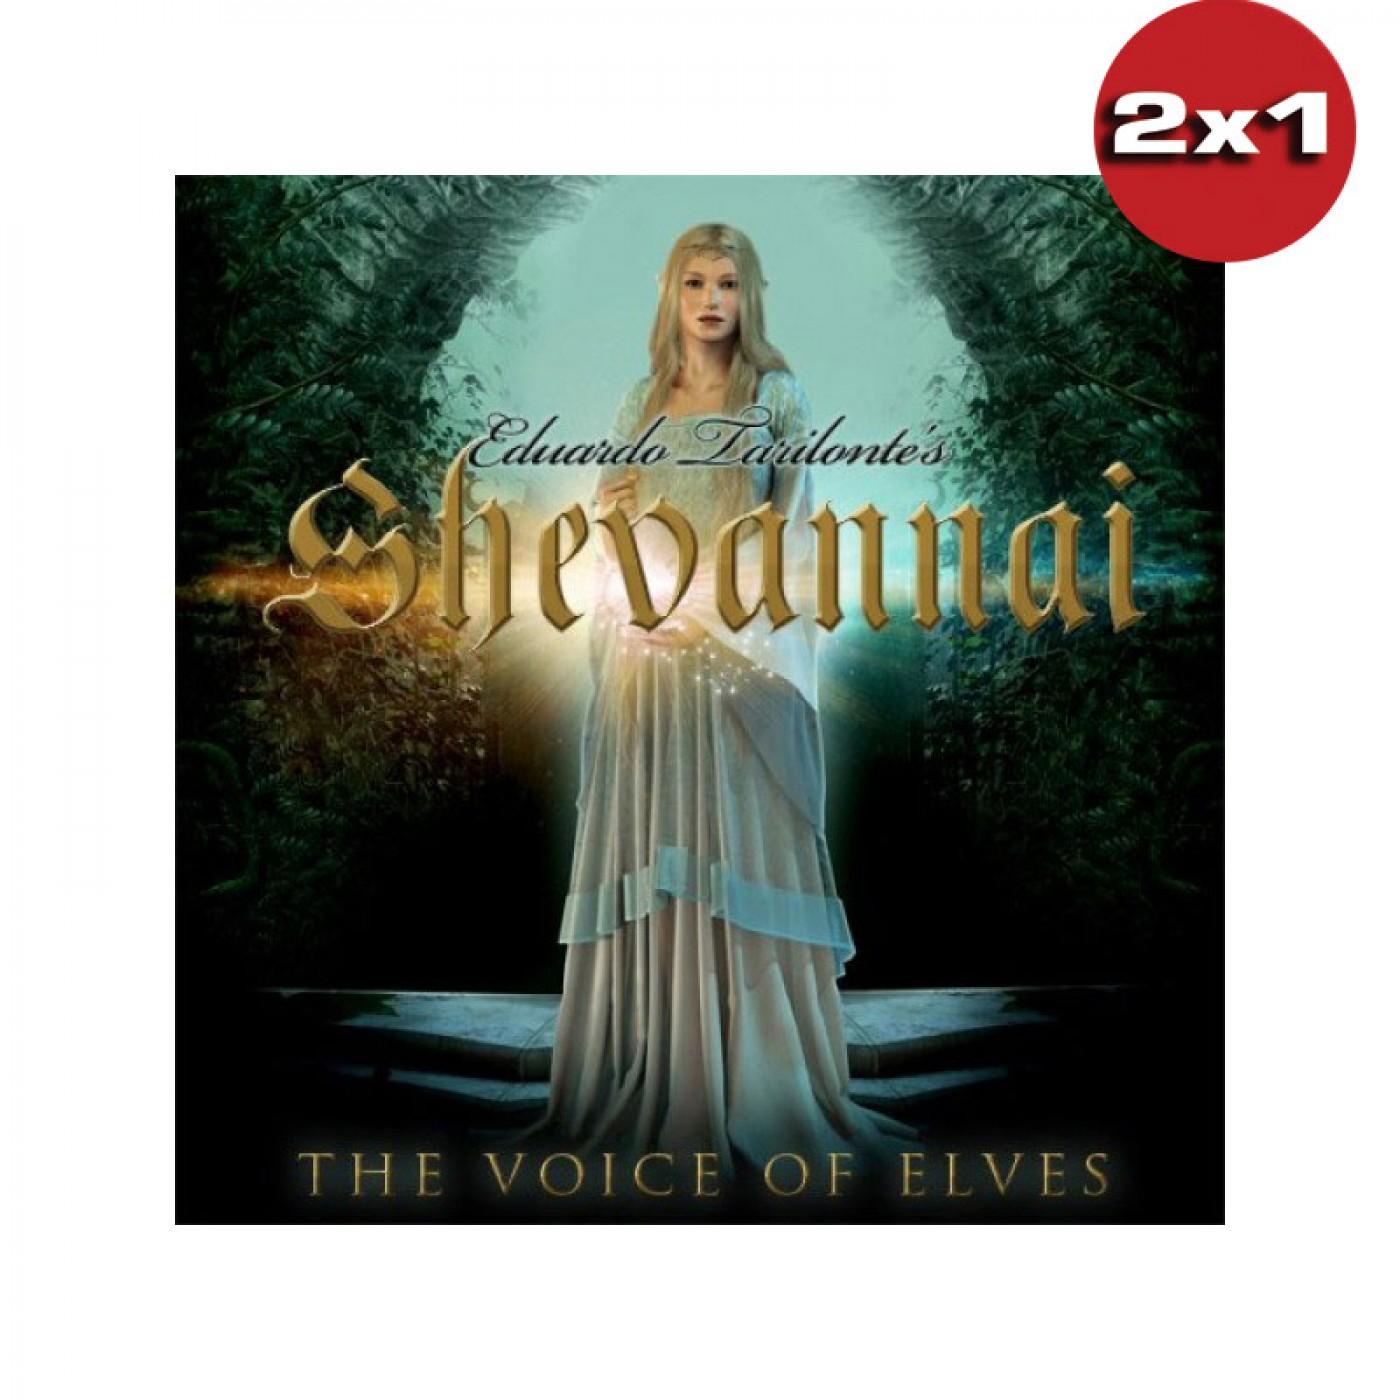 2x1 Best Service Shevannai Voice of Elves   Rage Audio